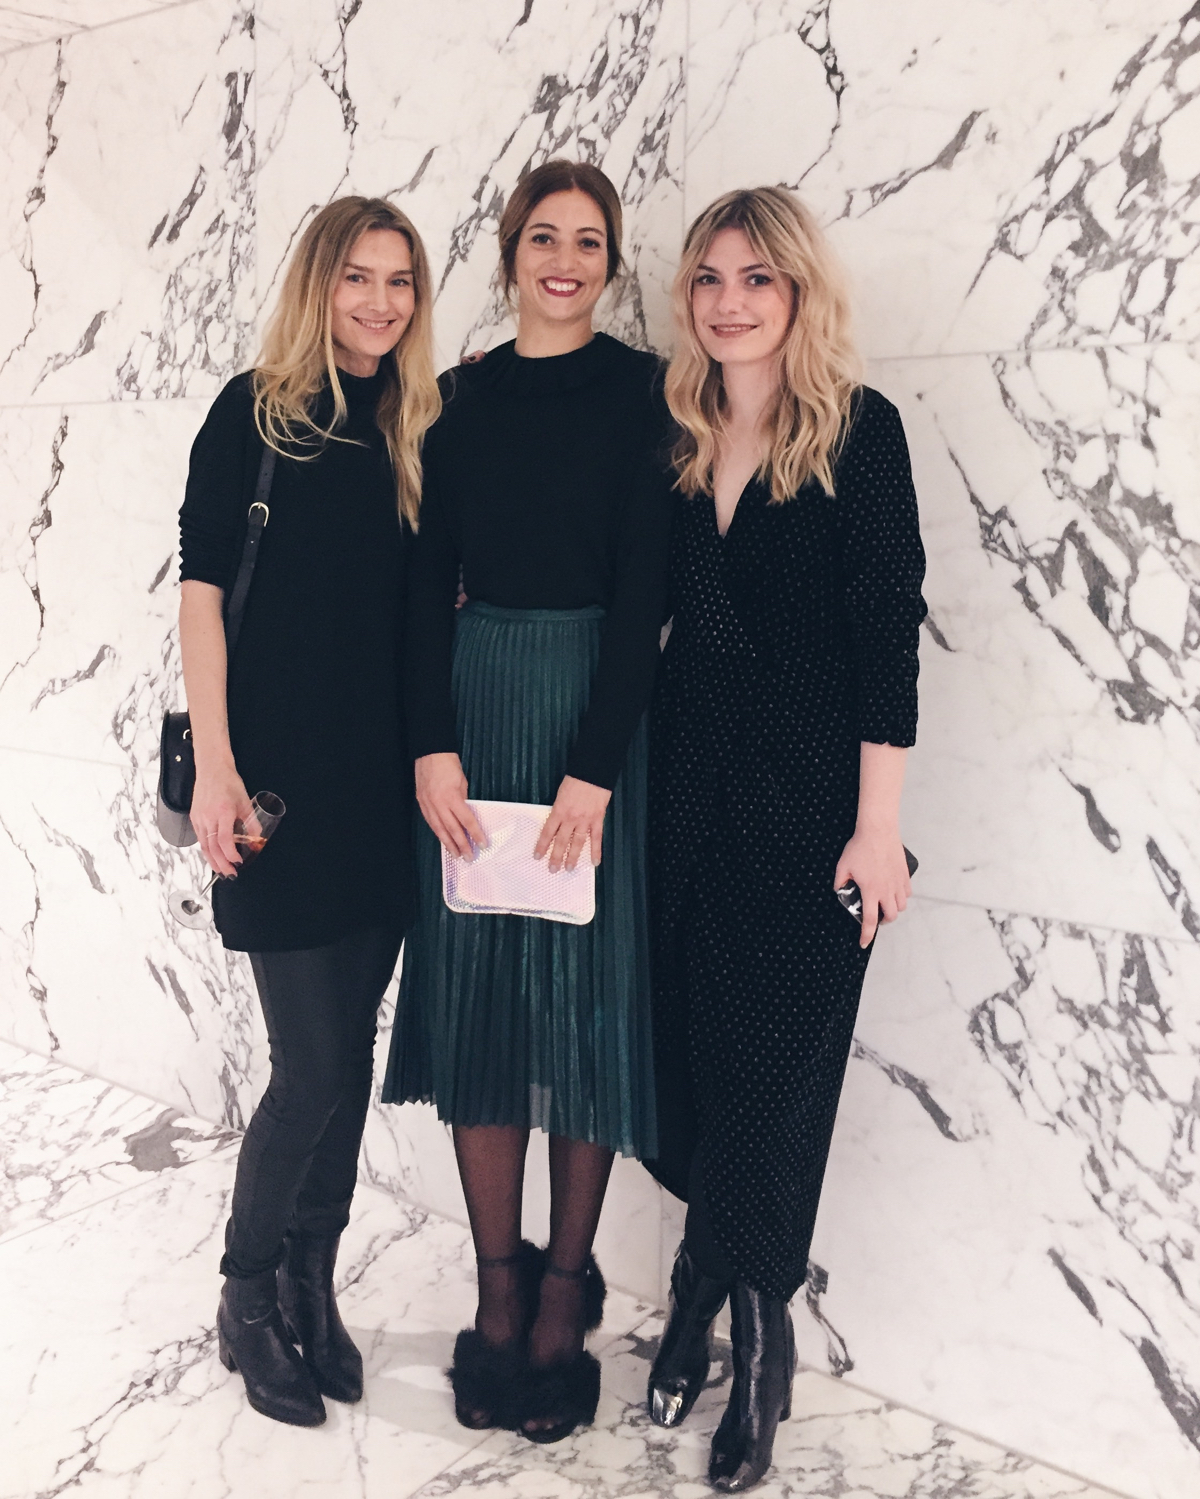 Beautyblog-Beauty-Blog-bare minds-Elina Neumann KaDeWe Reopening Come And See KaDeWe Berlin Peaks of the Weeks No8 1